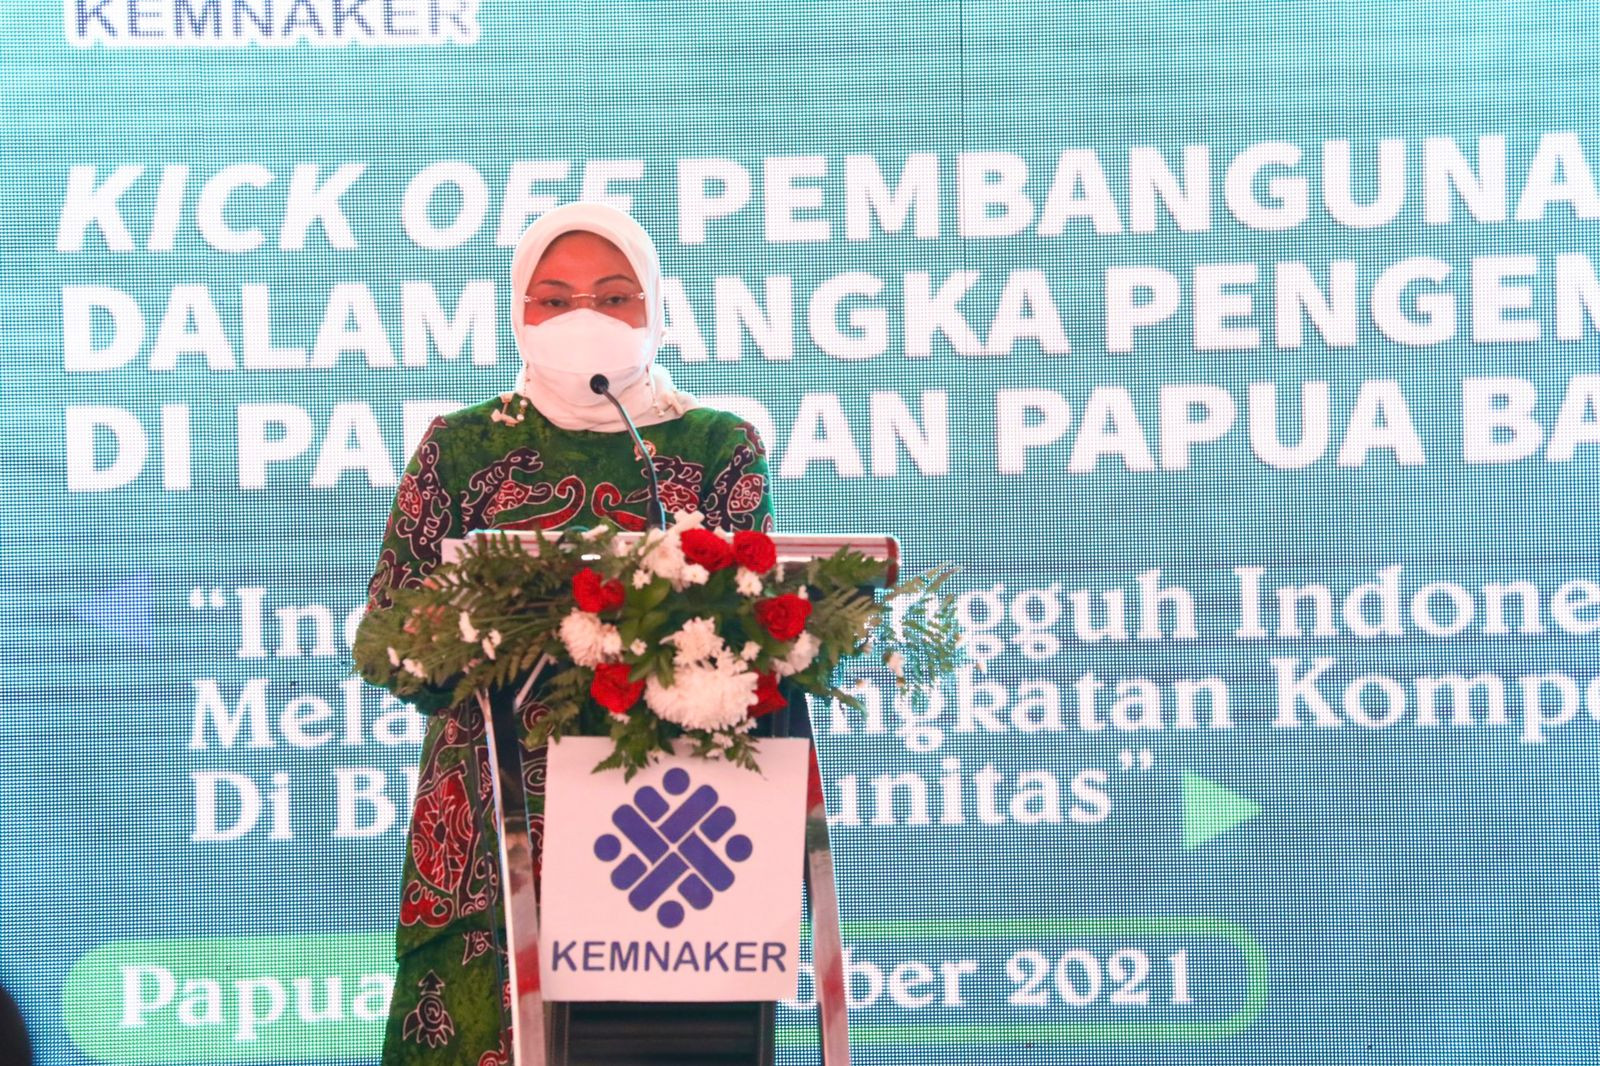 Wapres Ma'ruf Amin Resmikan BLK Komunitas di Papua dan Papua Barat - JPNN.com